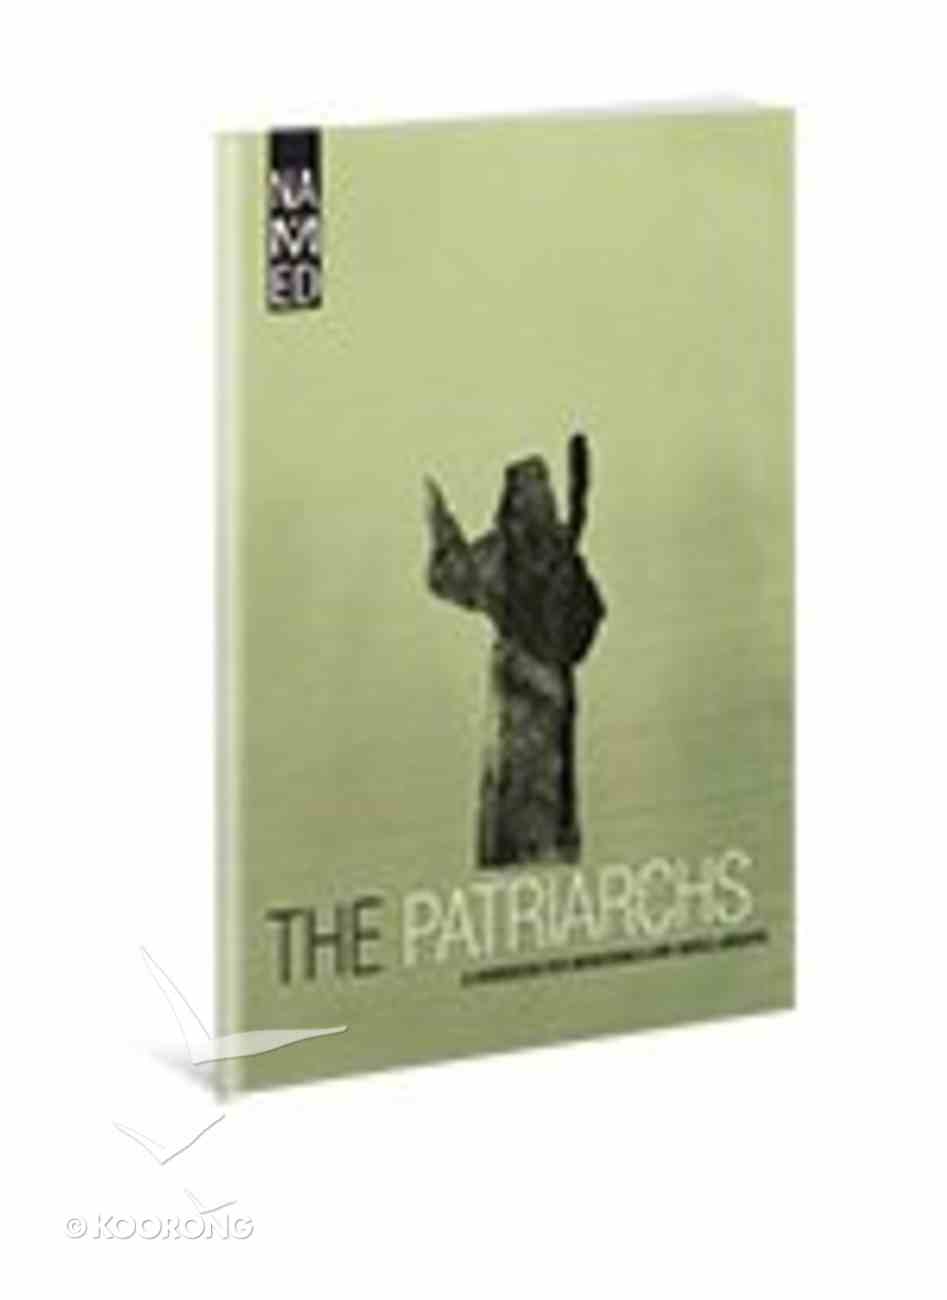 The Patriarchs (Workbook) (Named Series) Paperback